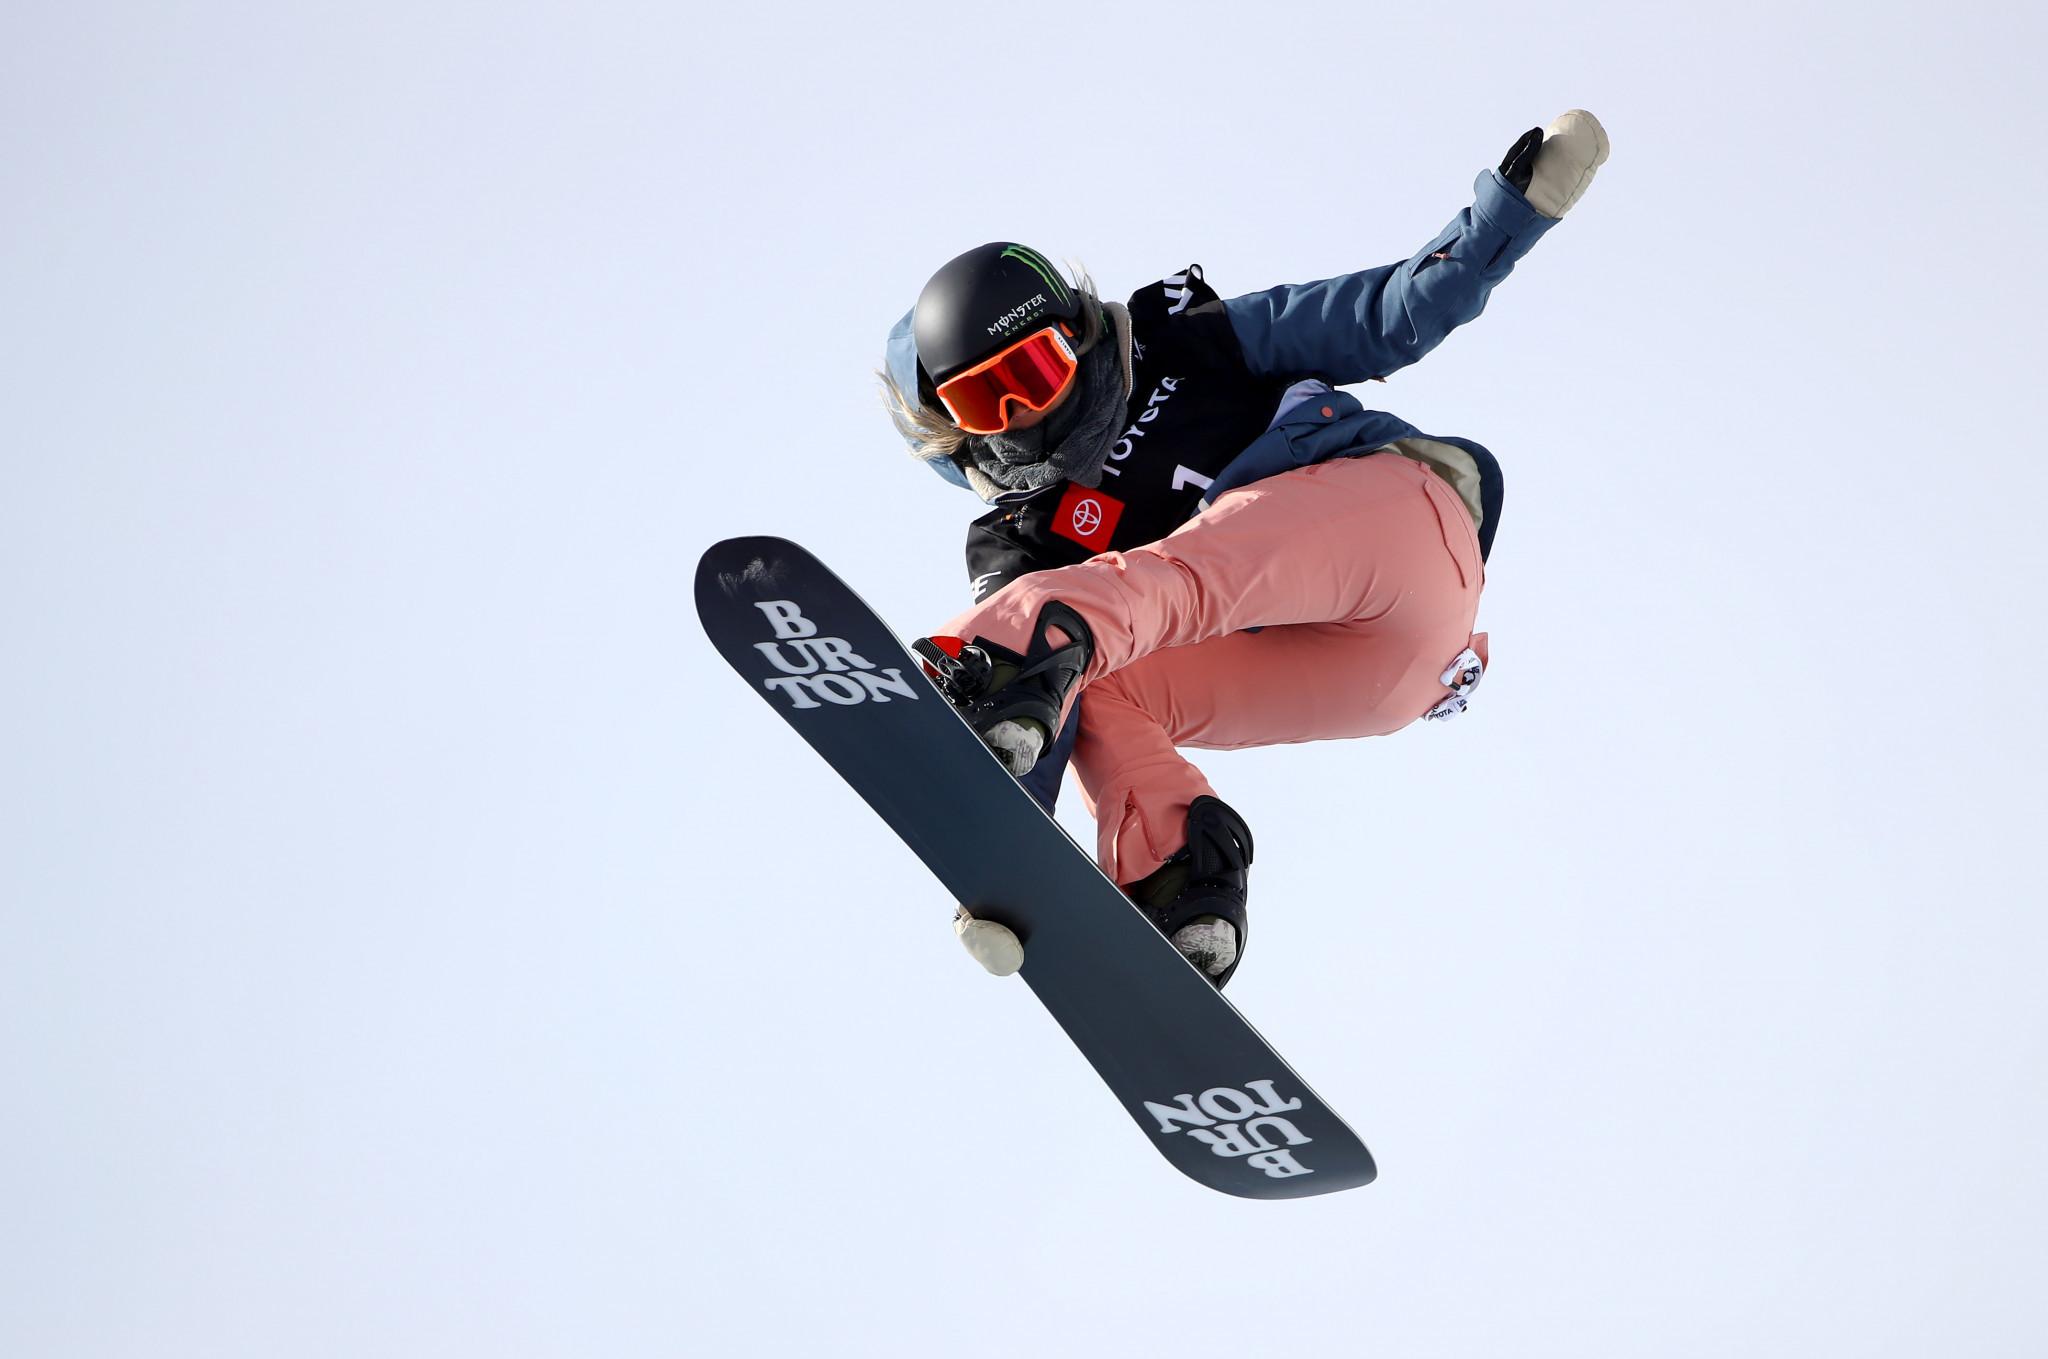 Olympic champion Kim set for return as US Snowboard team named for new season